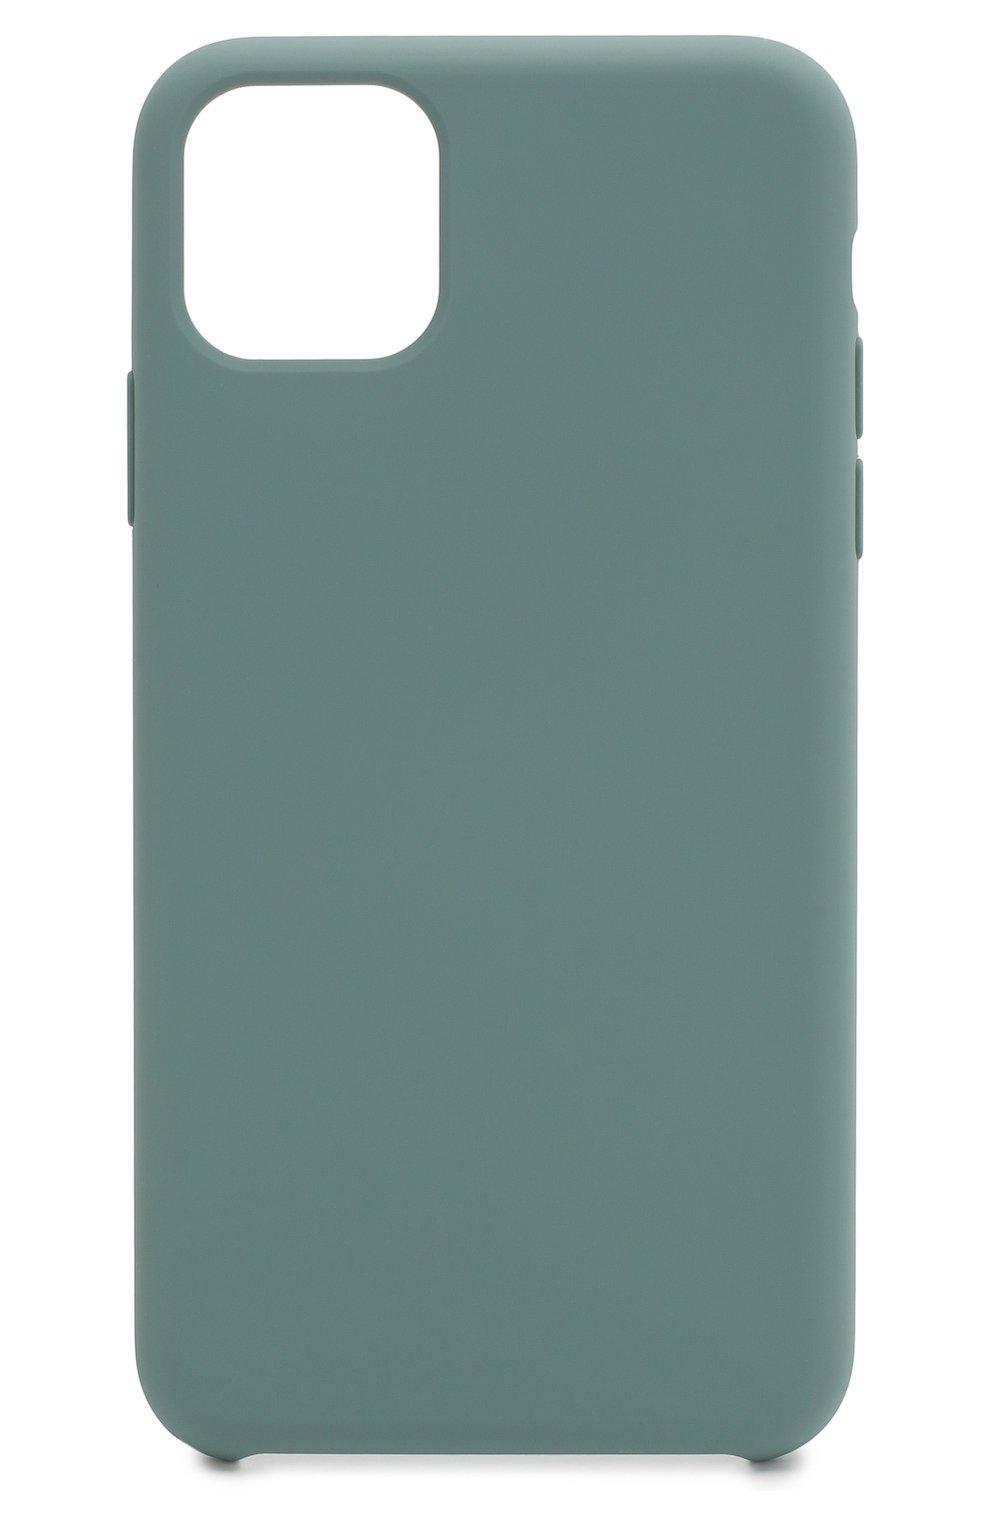 Мужской чехол для iphone 11 pro max UBEAR бирюзового цвета, арт. CS52GR65-I19 | Фото 1